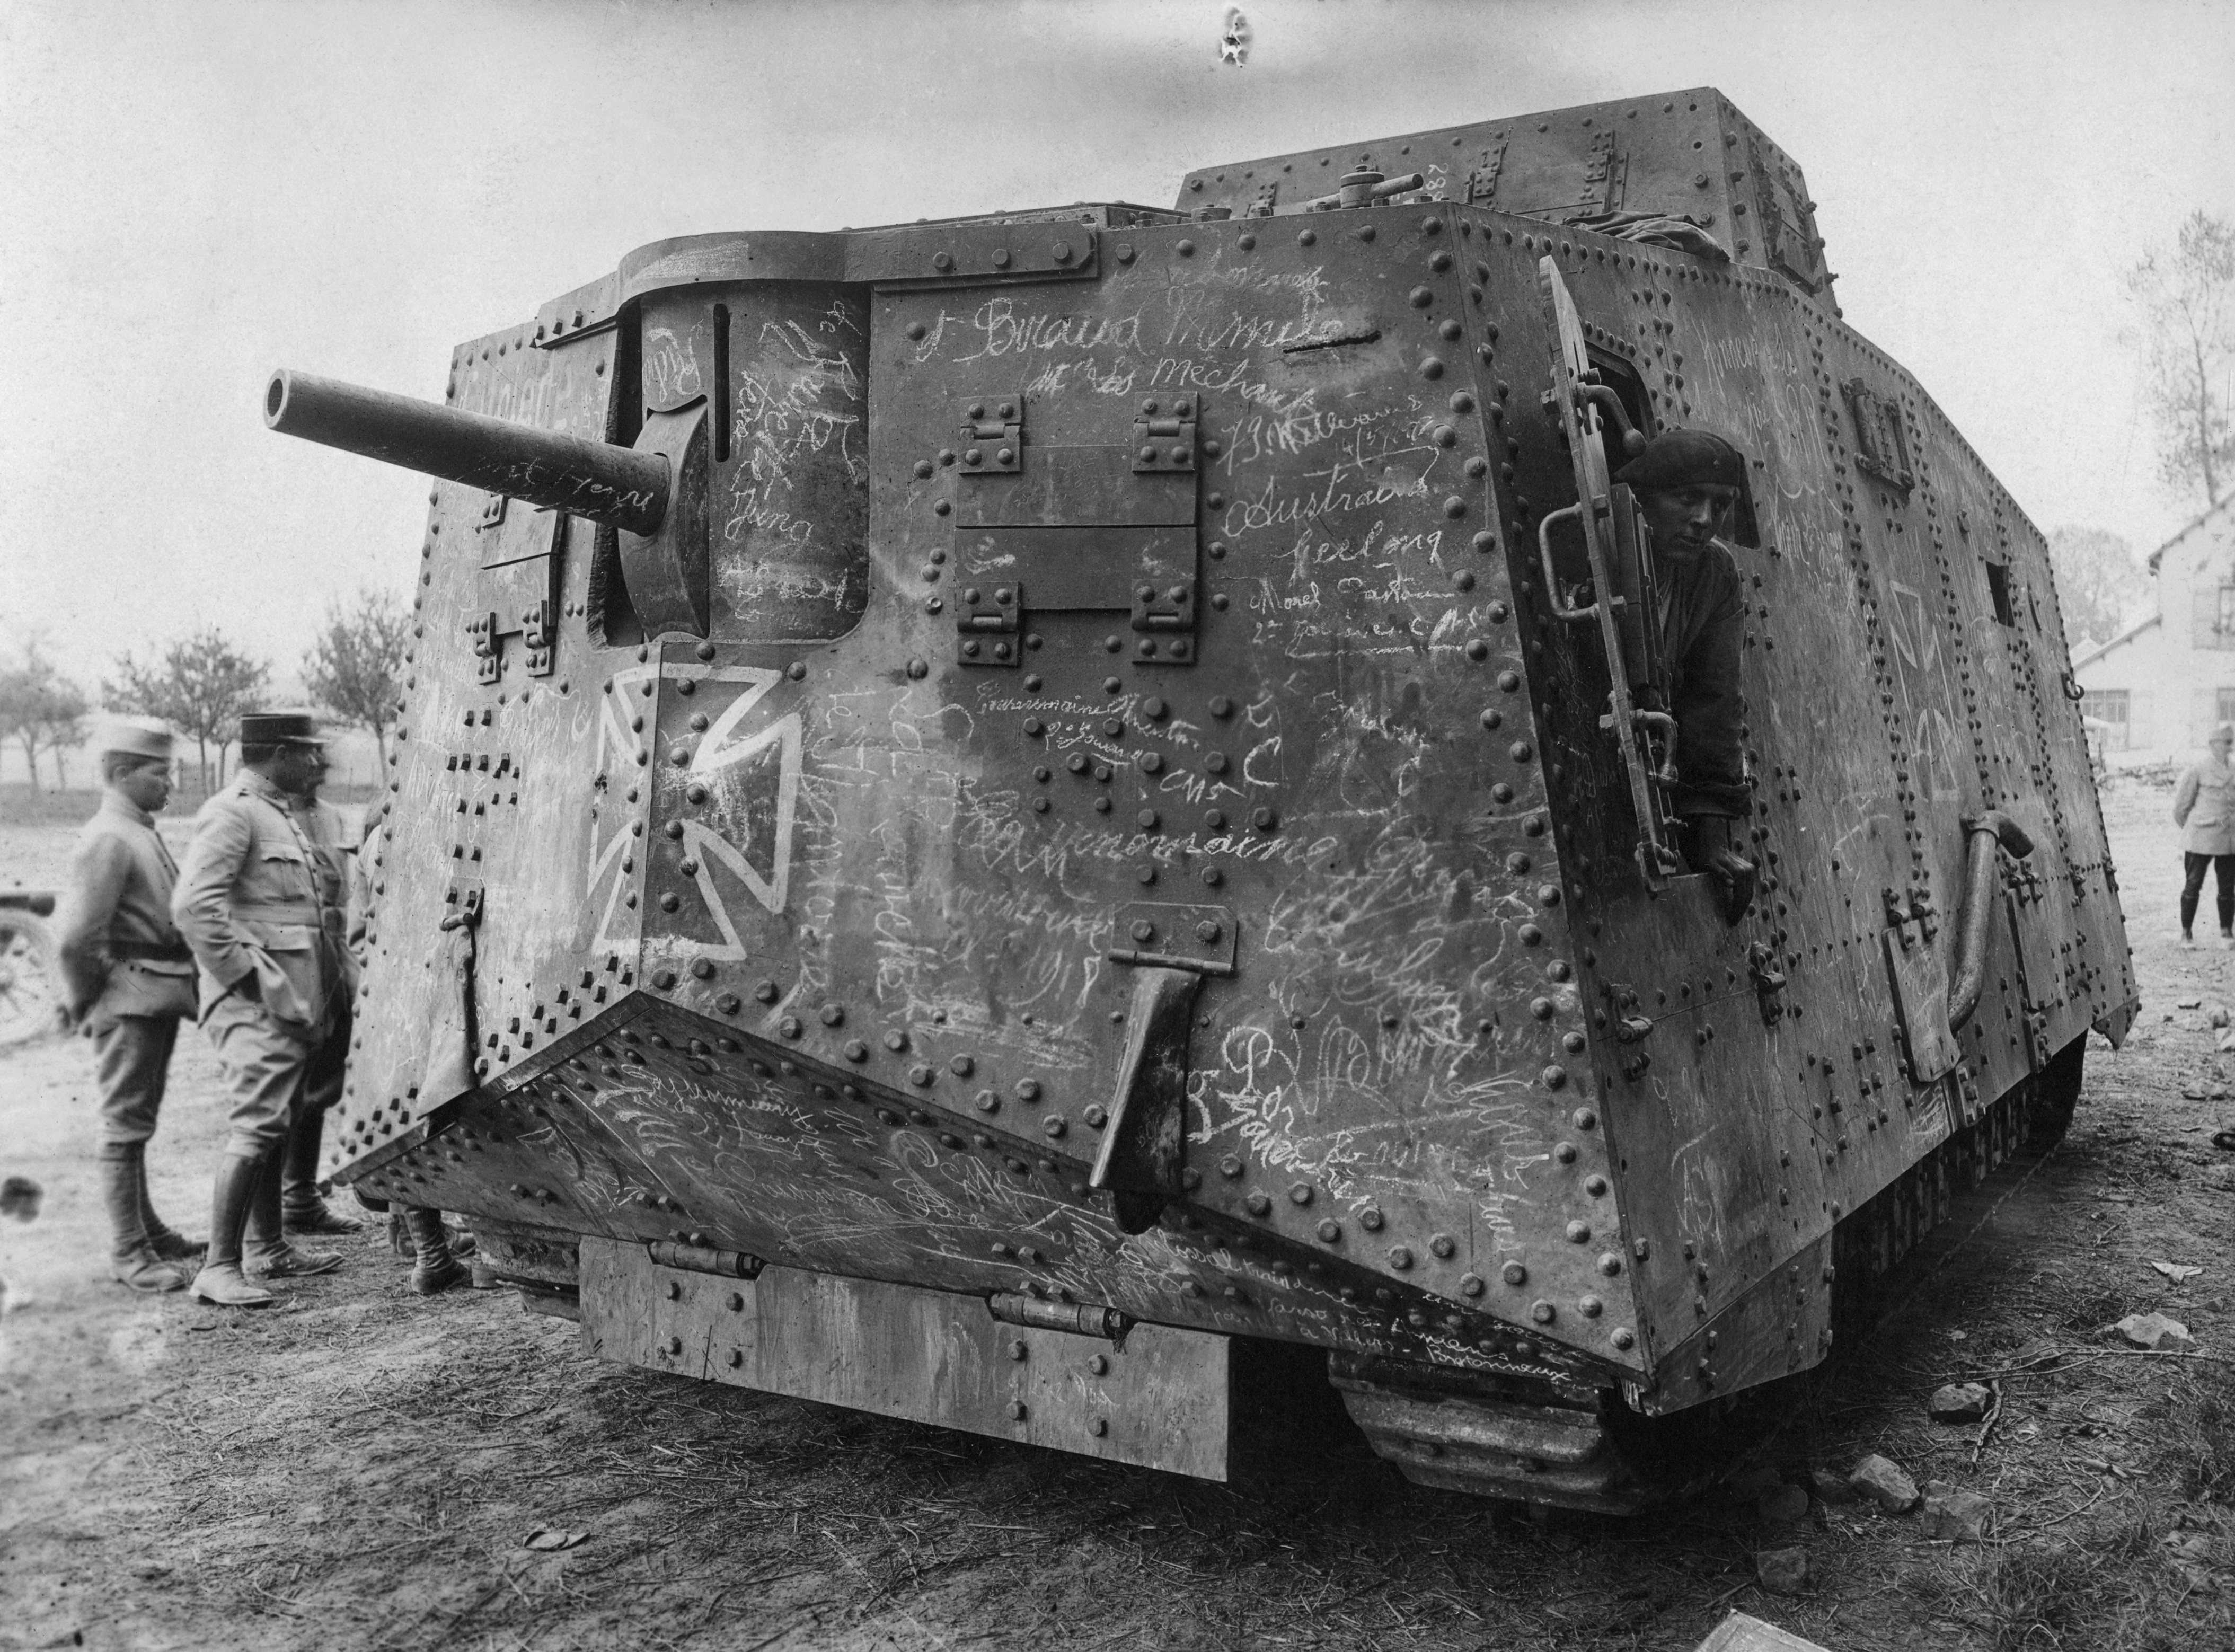 World War I: Technology Pictures - World War I History - HISTORY.com